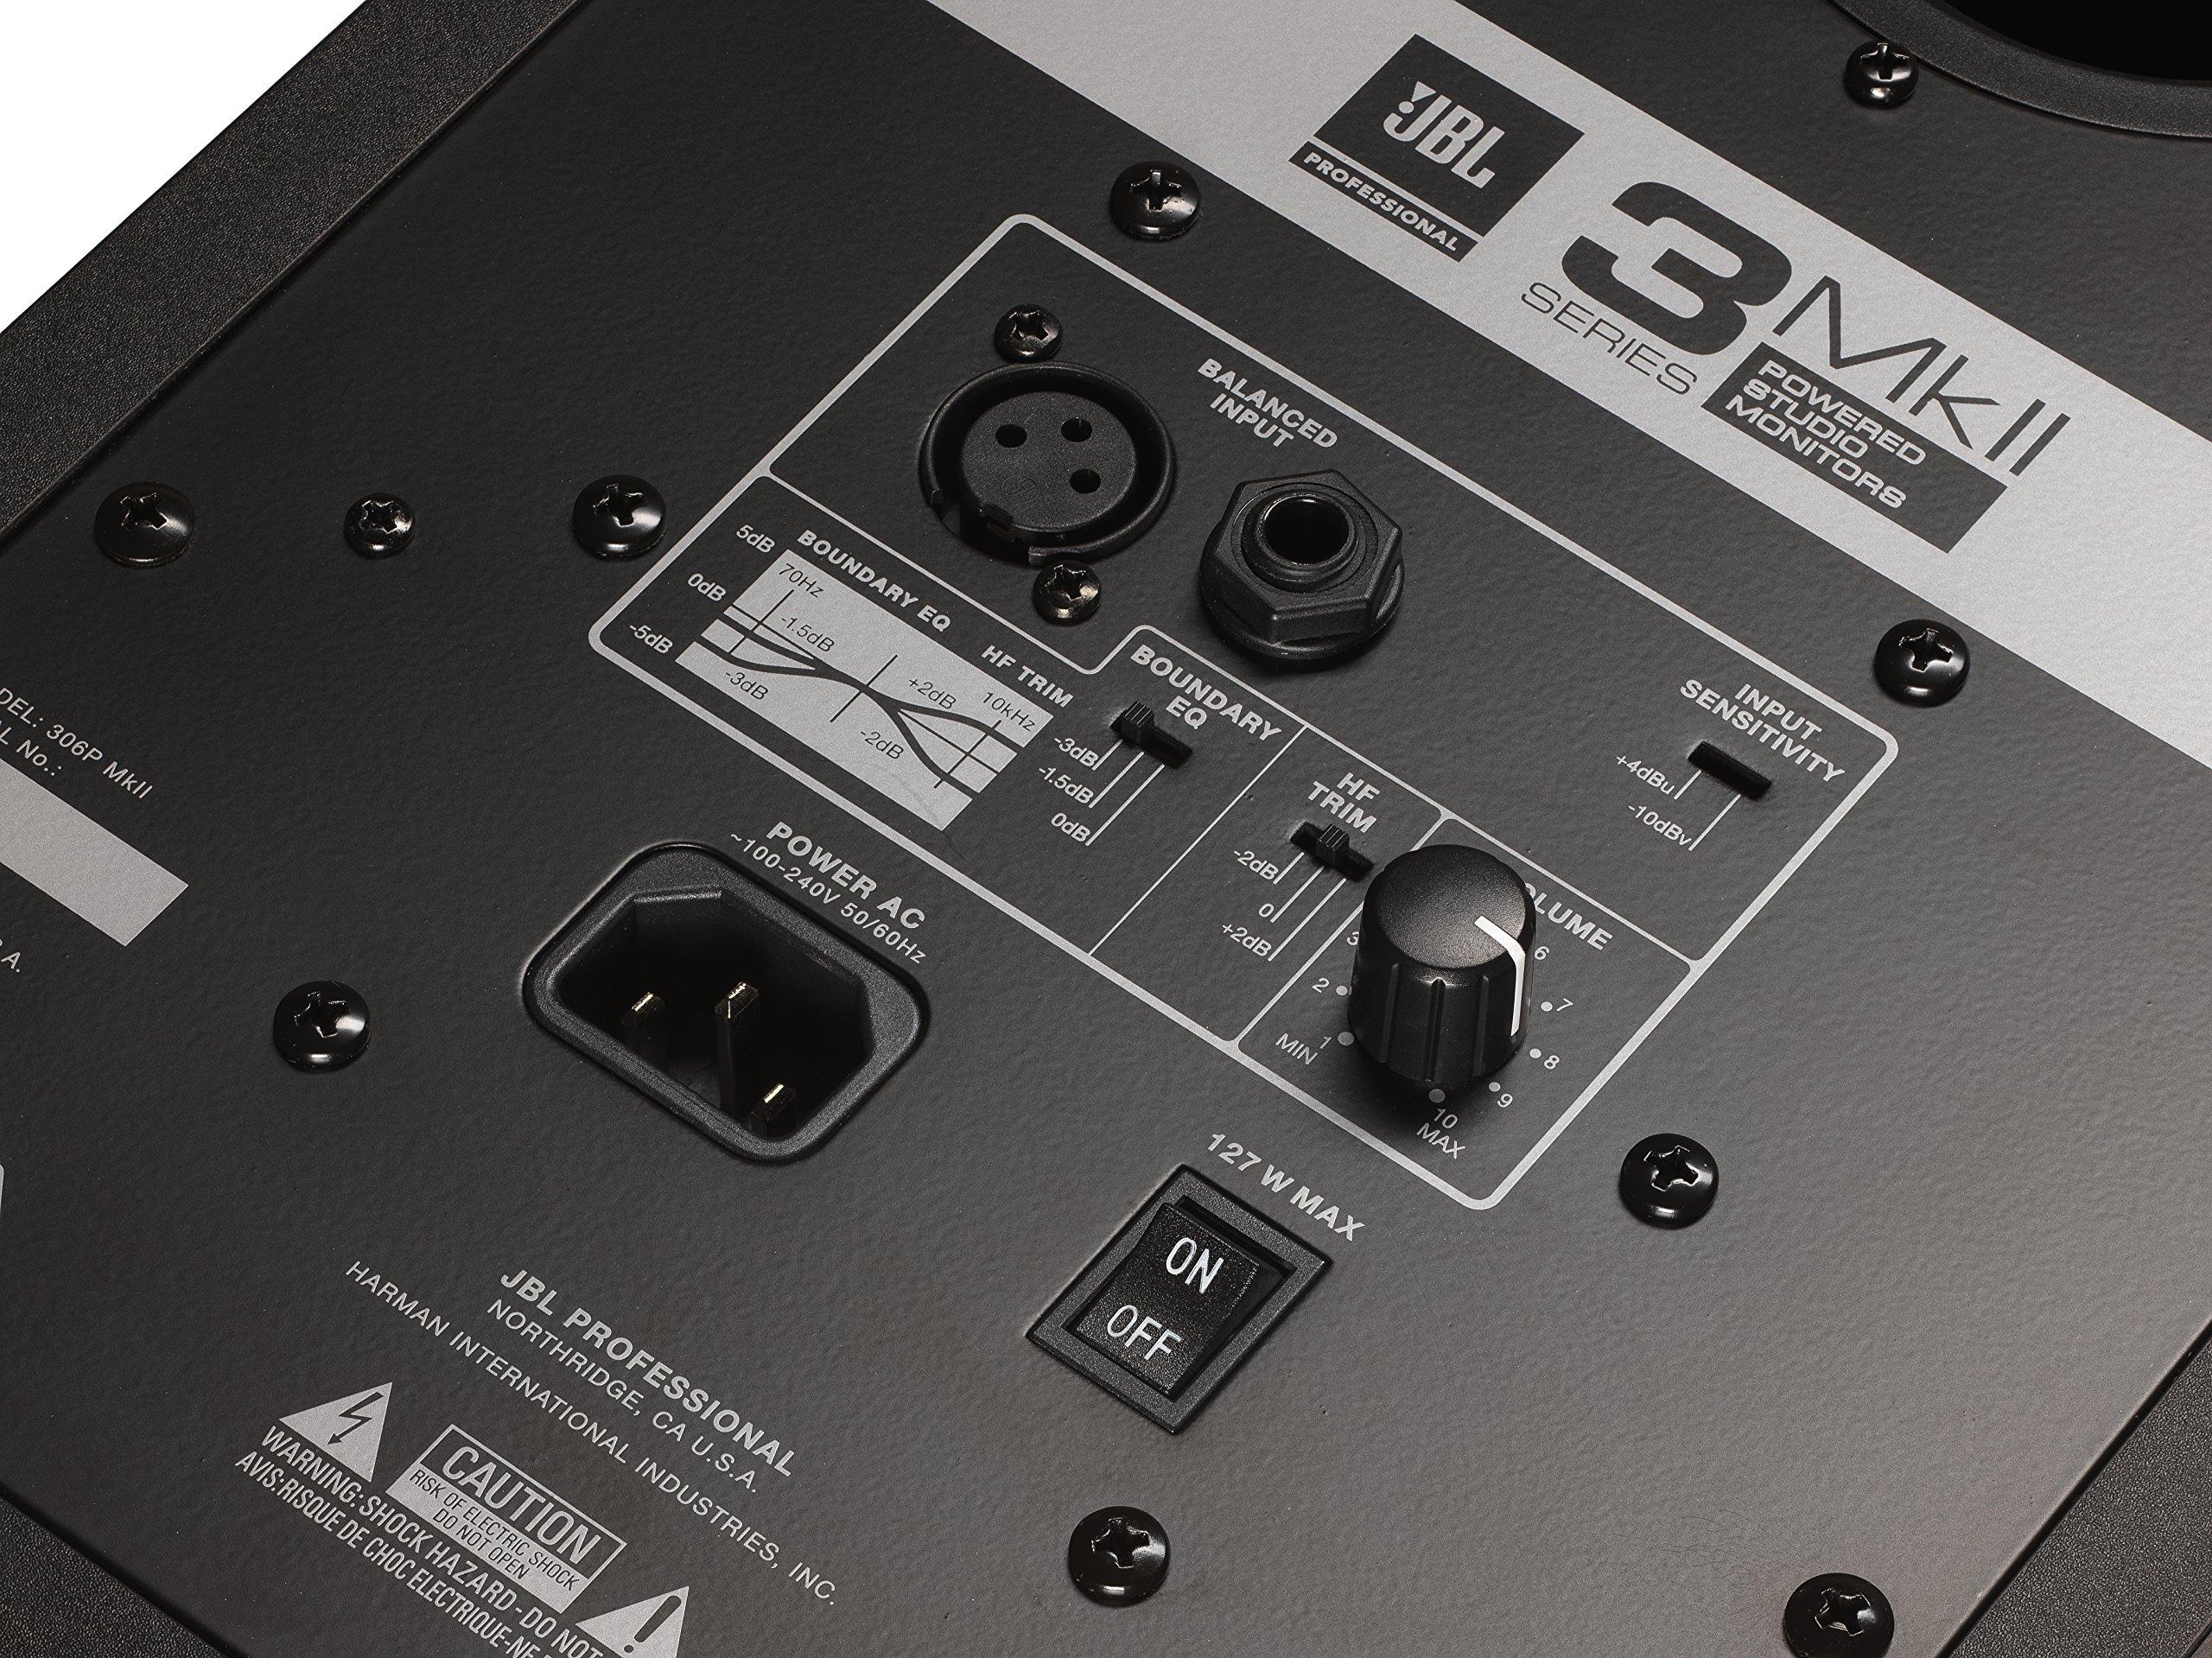 JBL 306P MkII 6'' 2-Way Powered Studio Monitor (new model) by JBL Professional (Image #8)